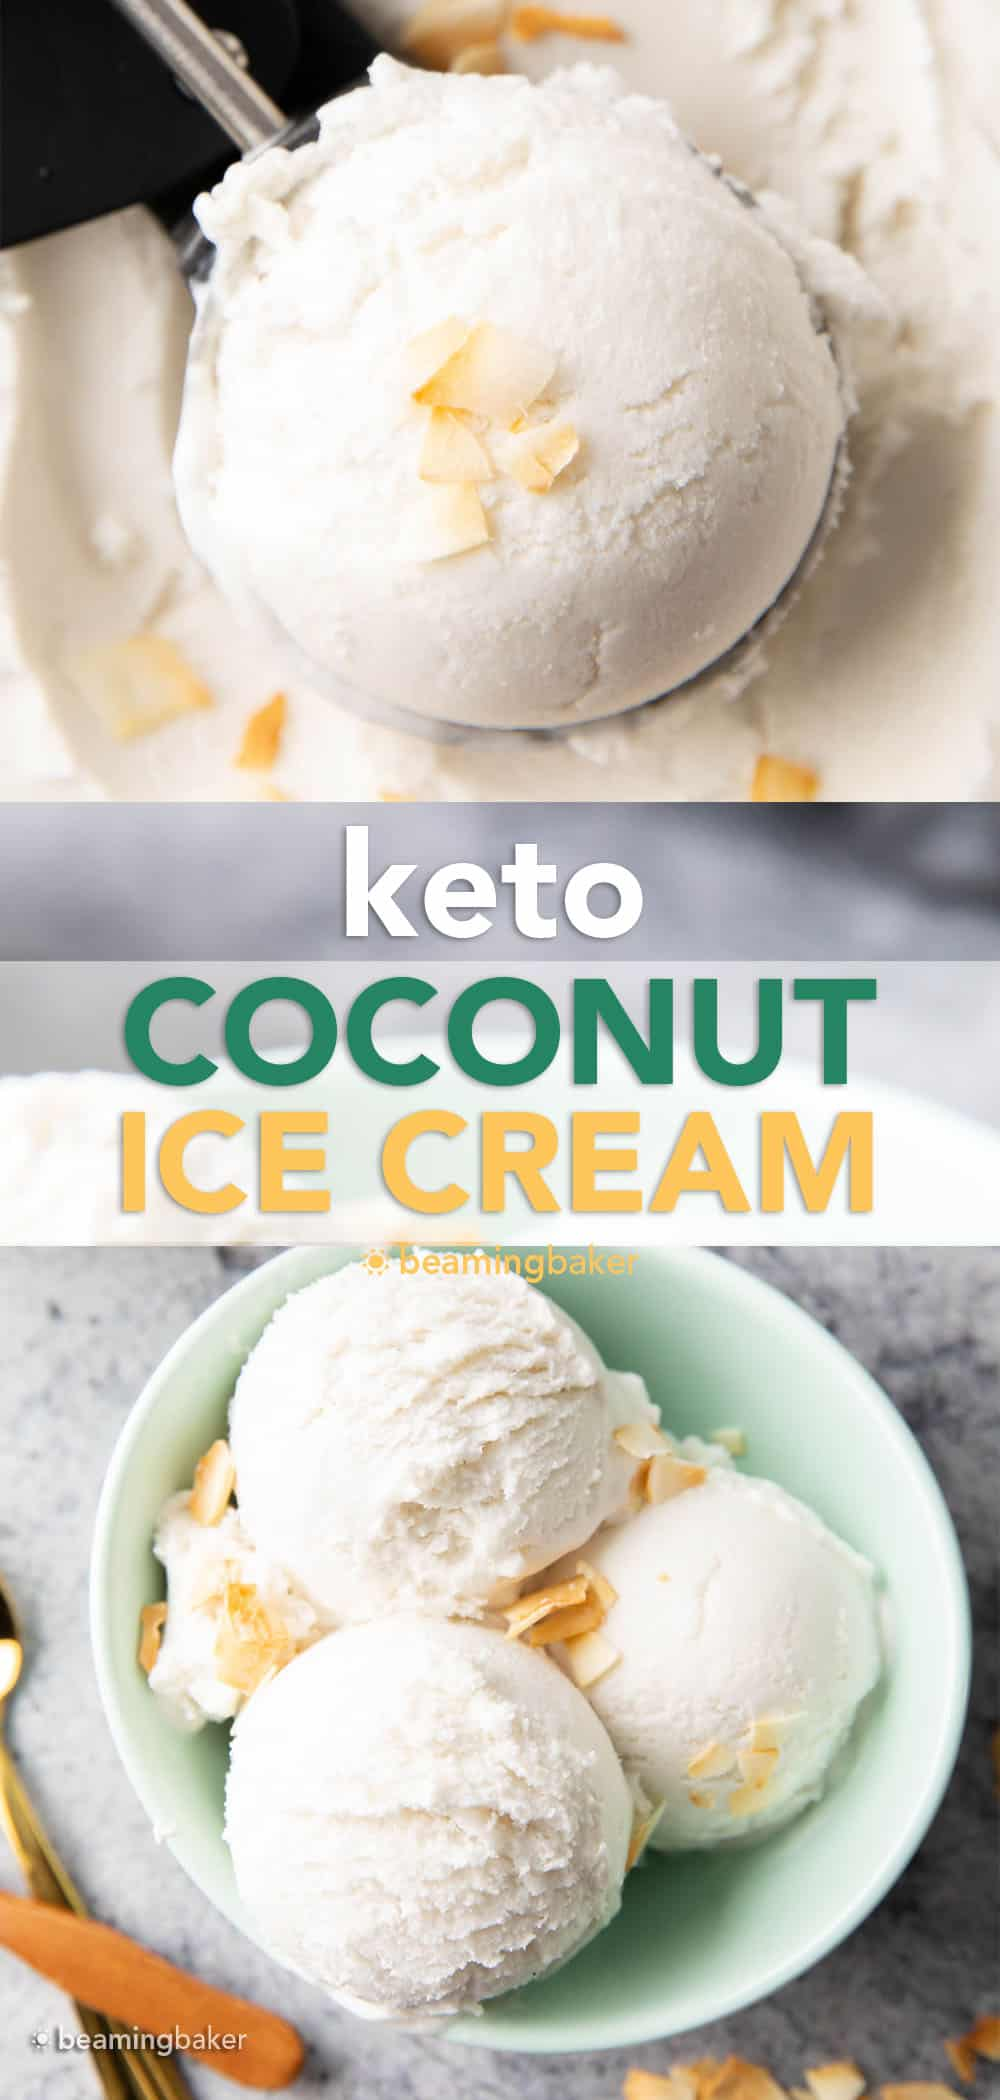 Coconut Milk Keto Ice Cream – Keto Coconut Ice Cream: the best coconut milk keto ice cream—bursting with coconut flavor & low carb. Keto coconut ice cream that has just 1 net carb per serving! #Keto #CoconutMilk #KetoIceCream #LowCarb #IceCream | Recipe at BeamingBaker.com